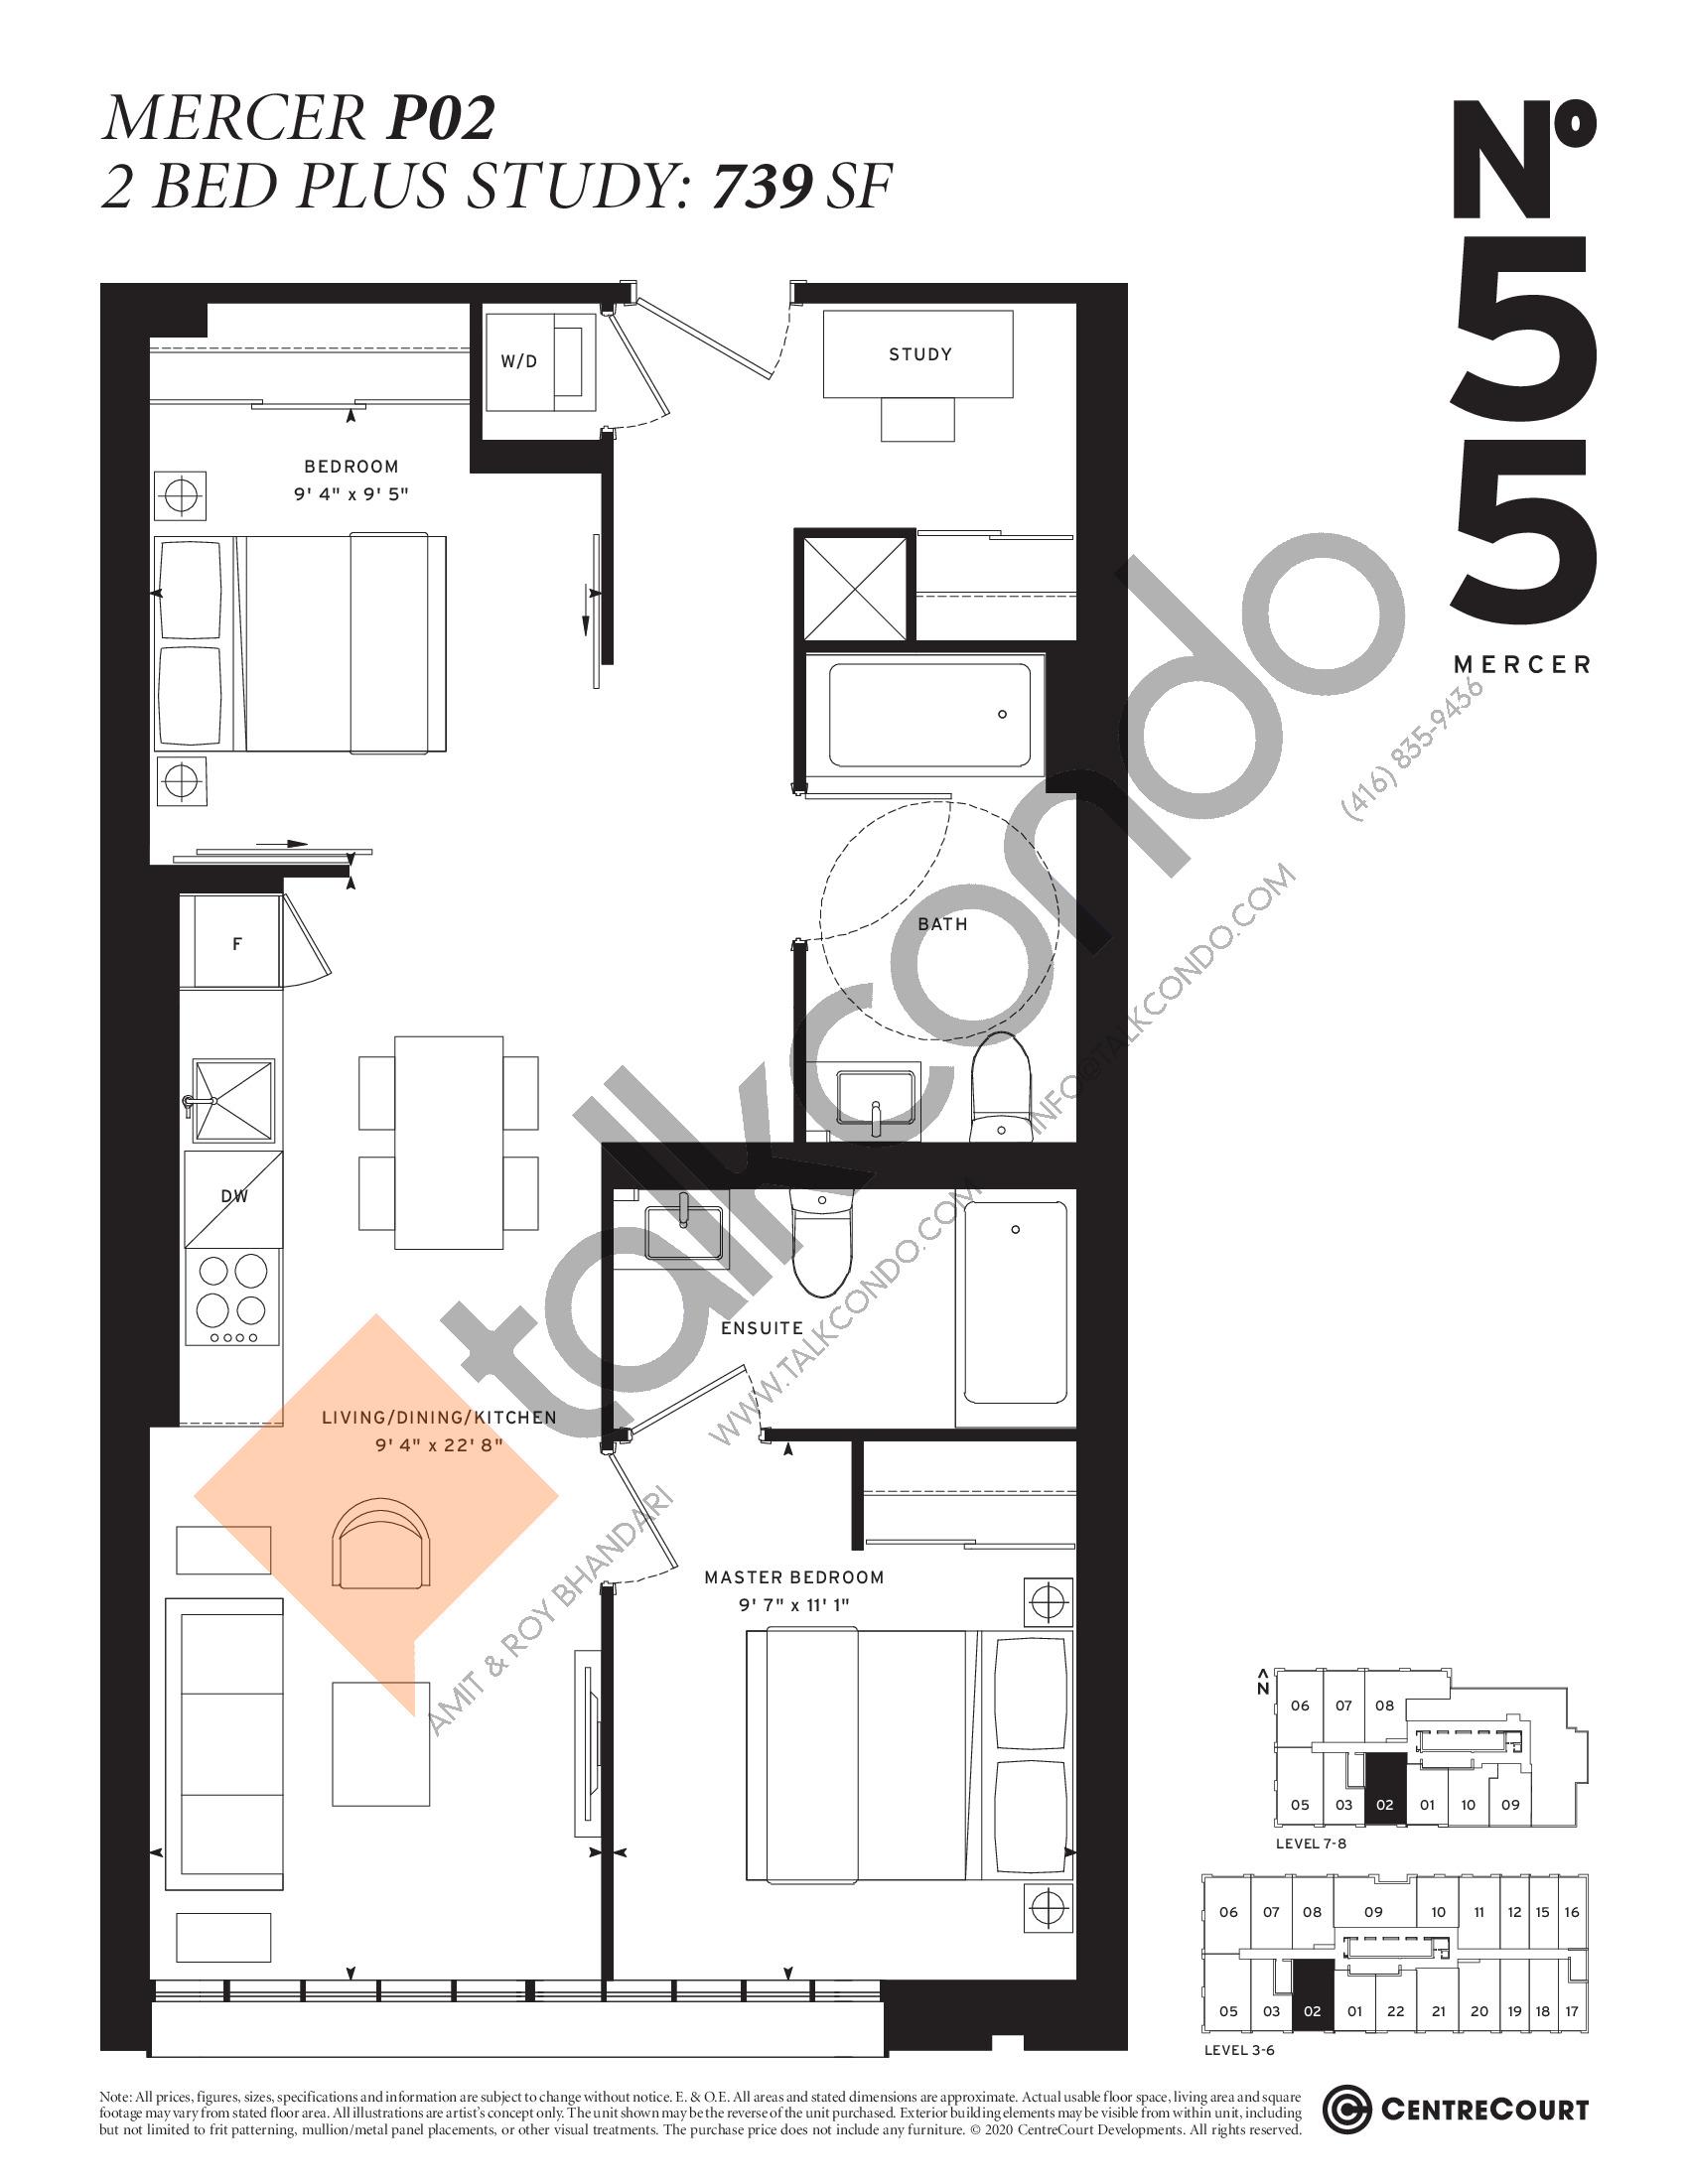 Mercer P02 Floor Plan at No. 55 Mercer Condos - 739 sq.ft